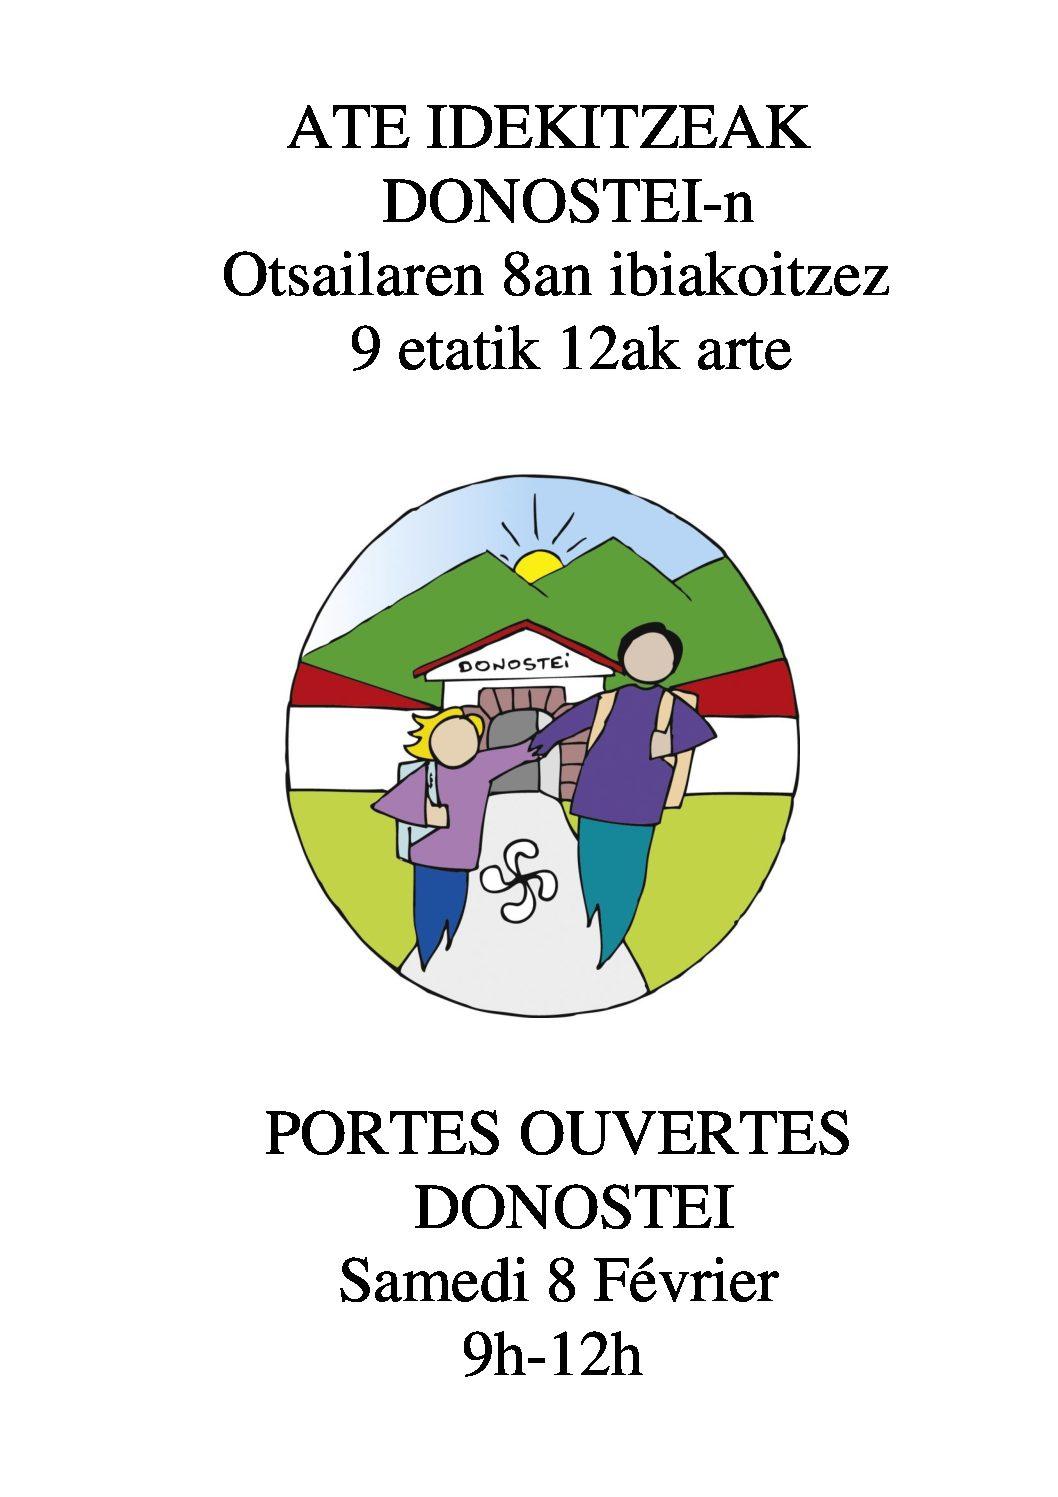 Eskolako Ate idekitzeak / Portes ouvertes de l'école